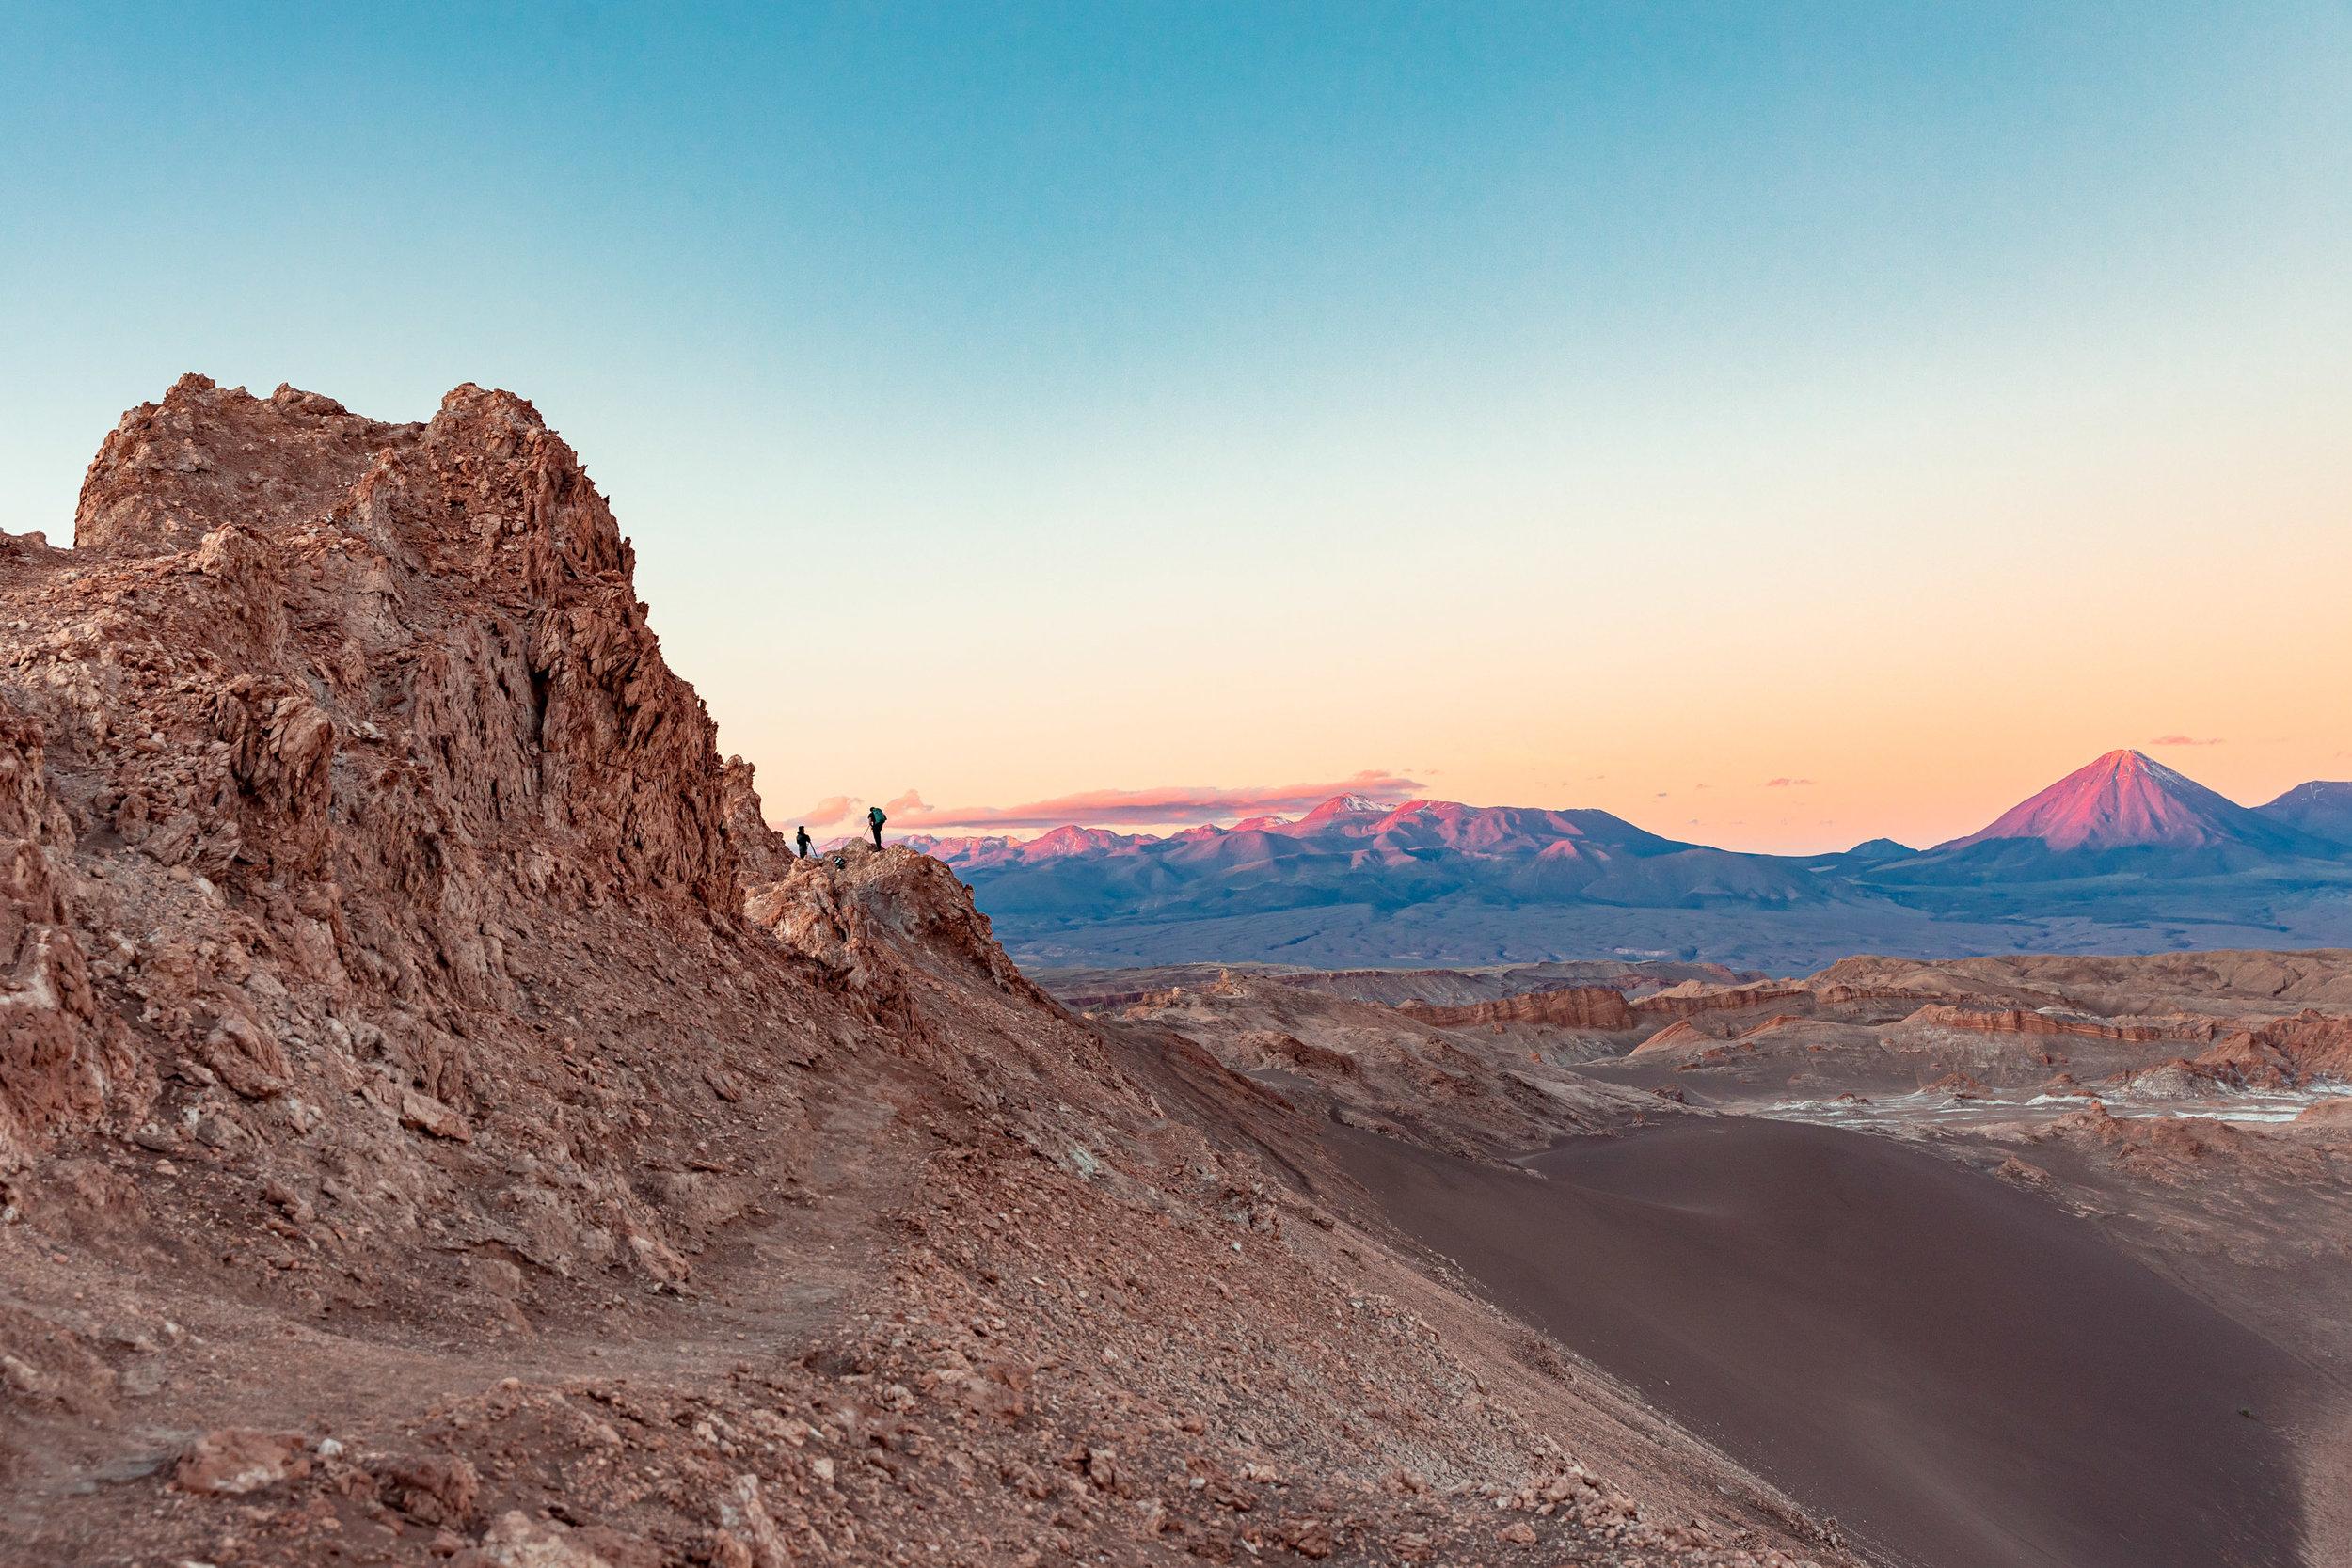 evanbdudley-Chile-Eclipse-19-0235.jpg